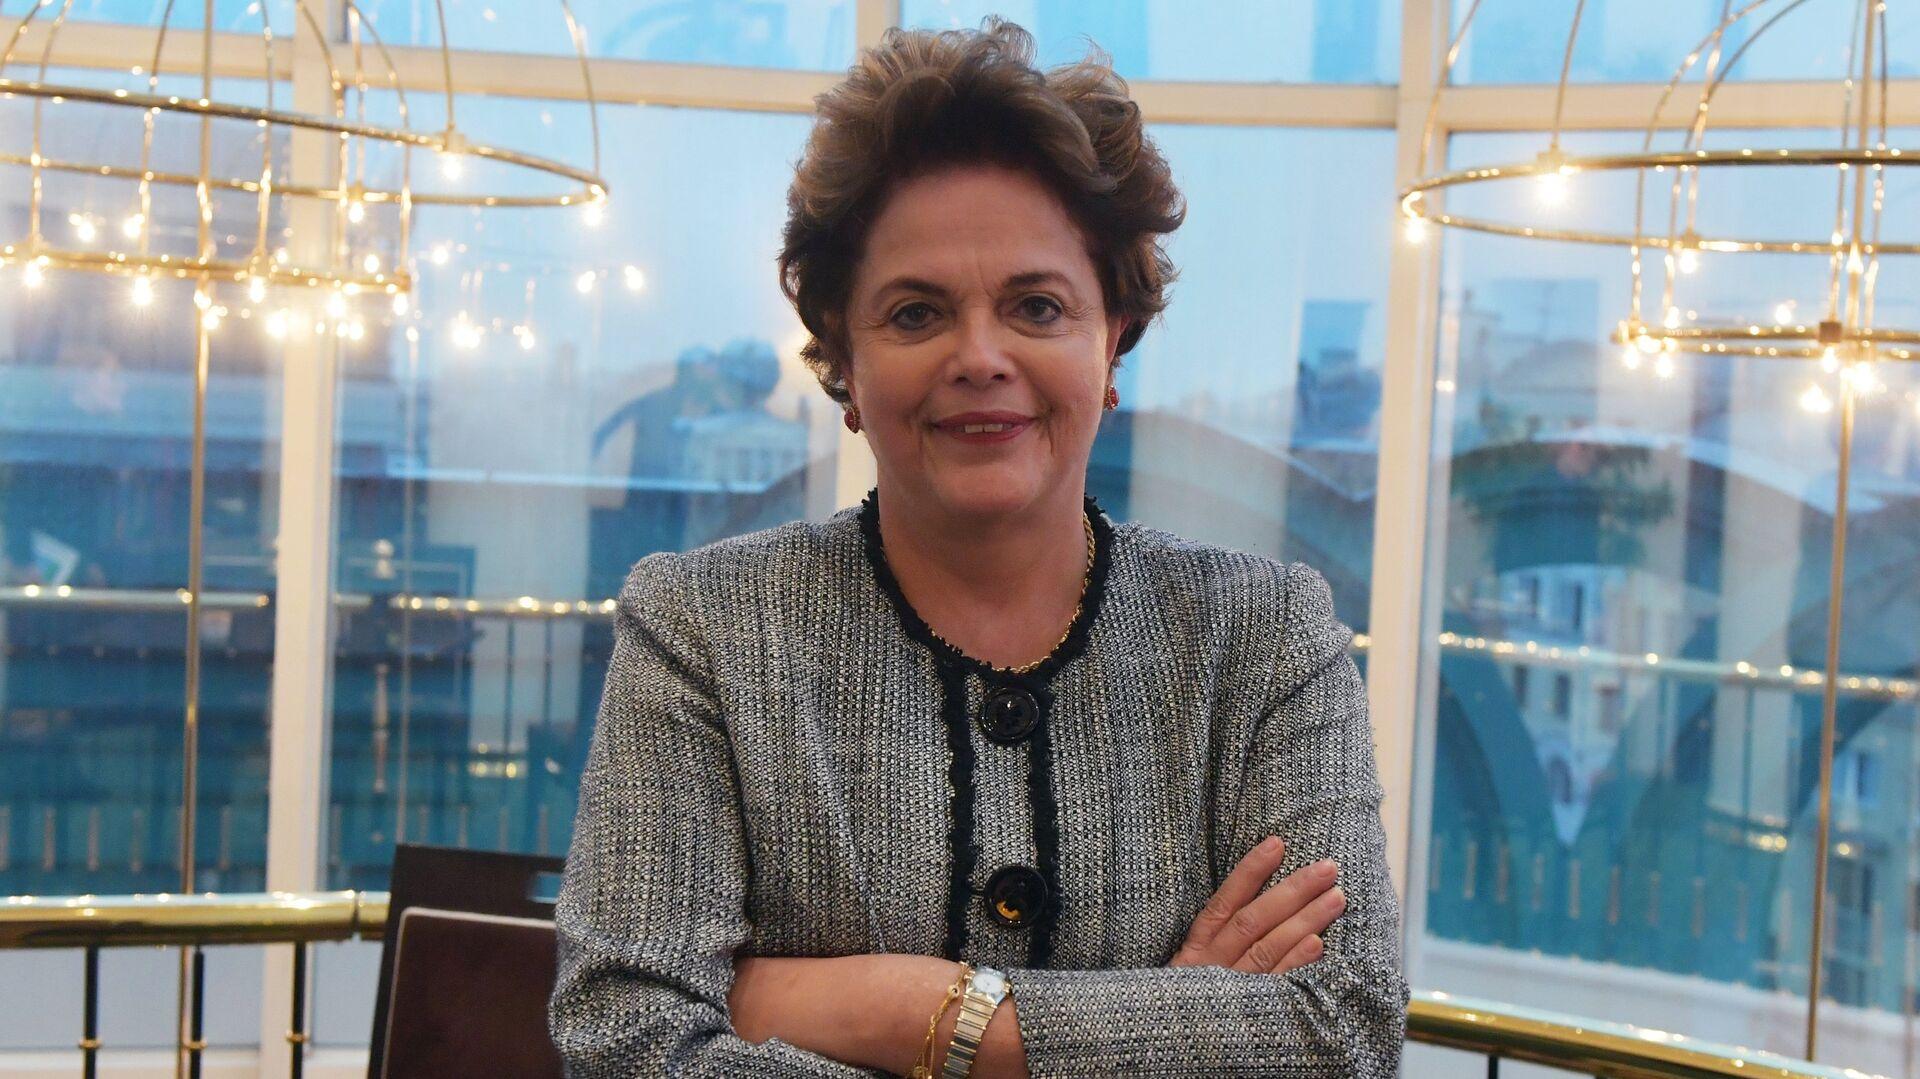 La exmandataria brasileña Dilma Rousseff - Sputnik Mundo, 1920, 17.06.2021